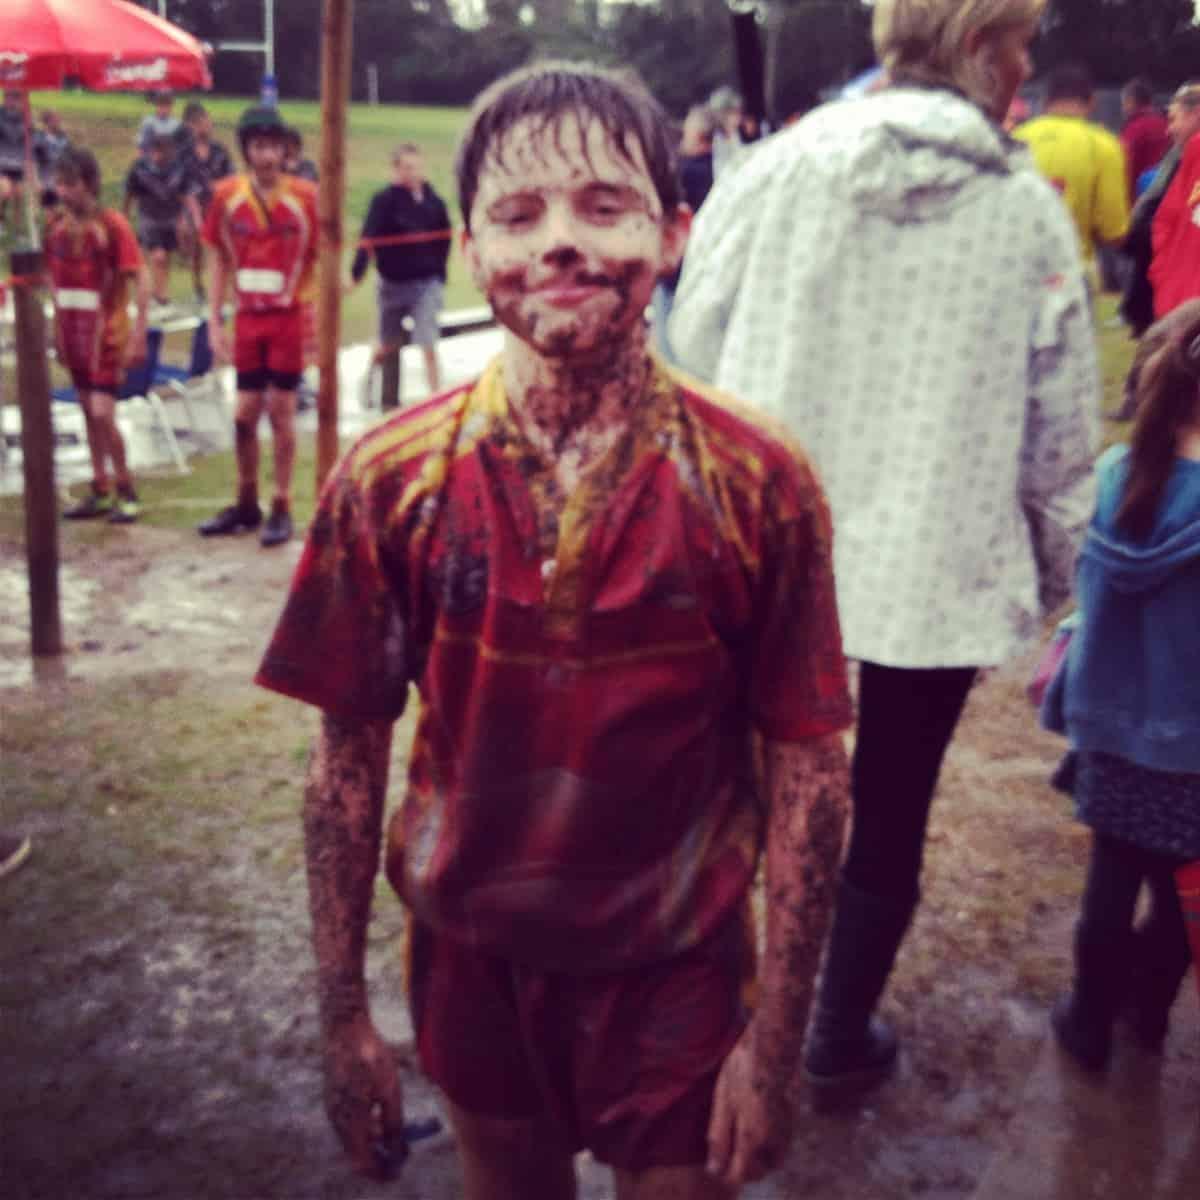 Dexter muddy man